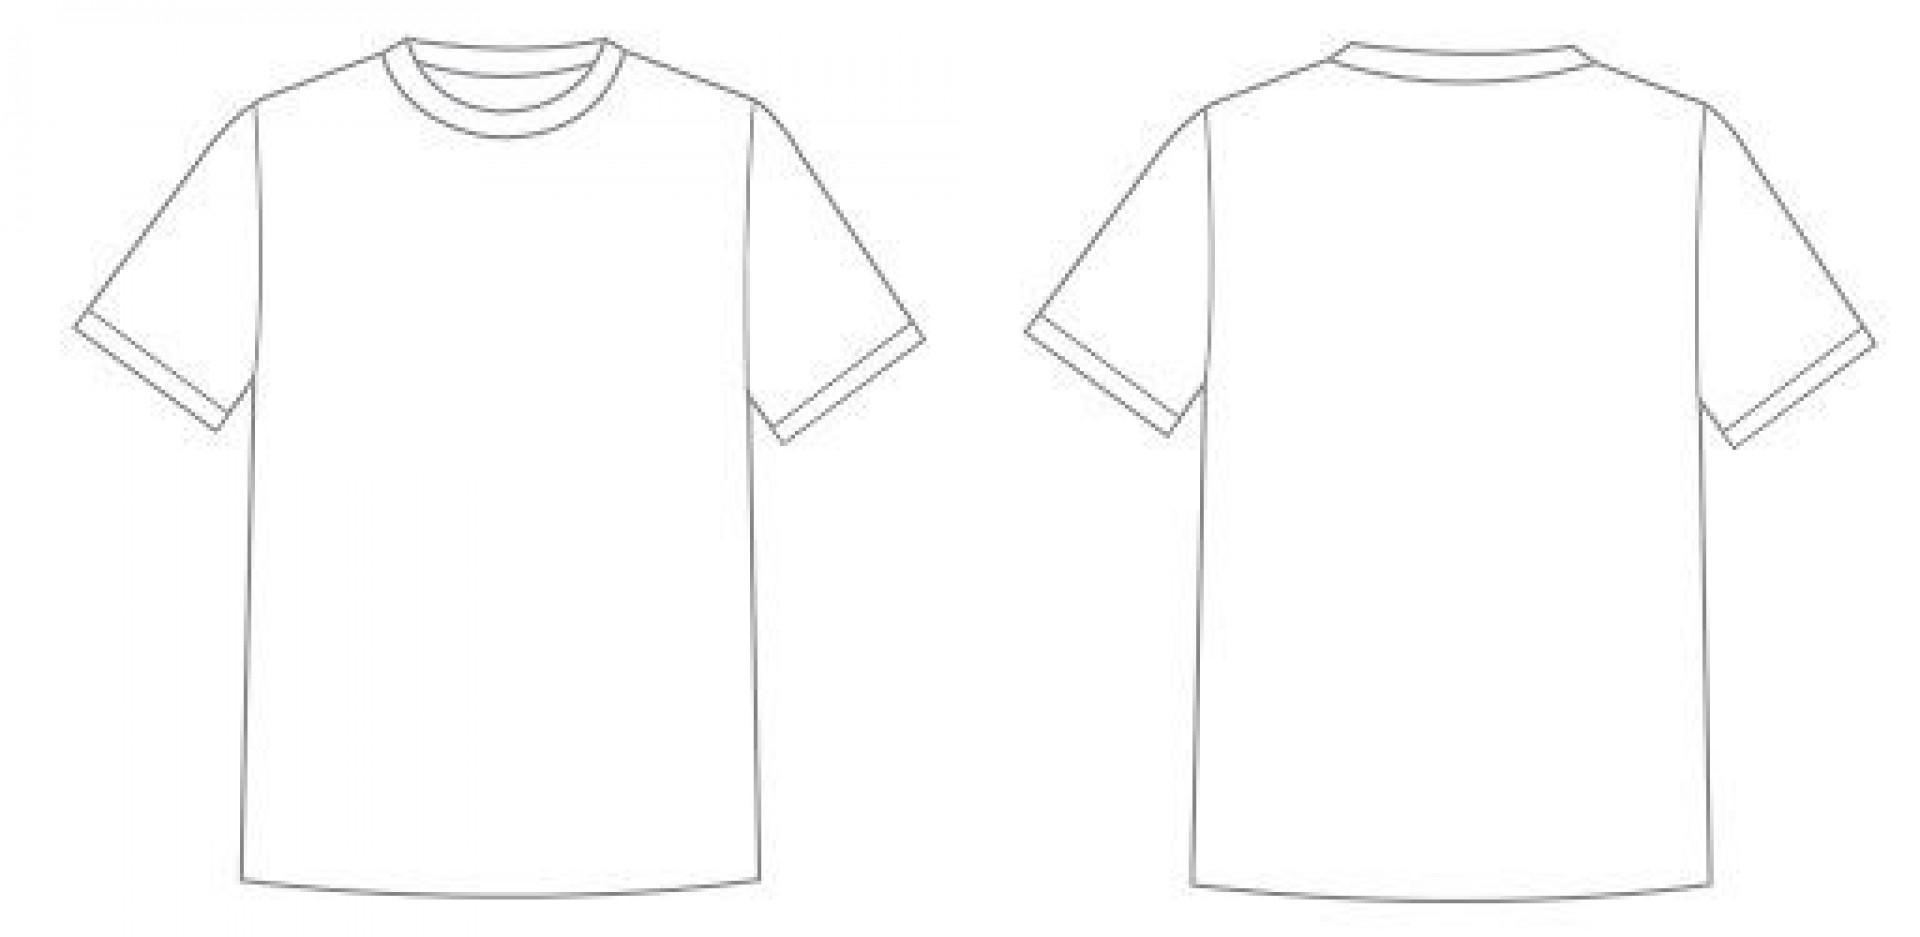 001 Astounding T Shirt Design Template Psd High Definition  Blank T-shirt Free Download Layout Photoshop1920